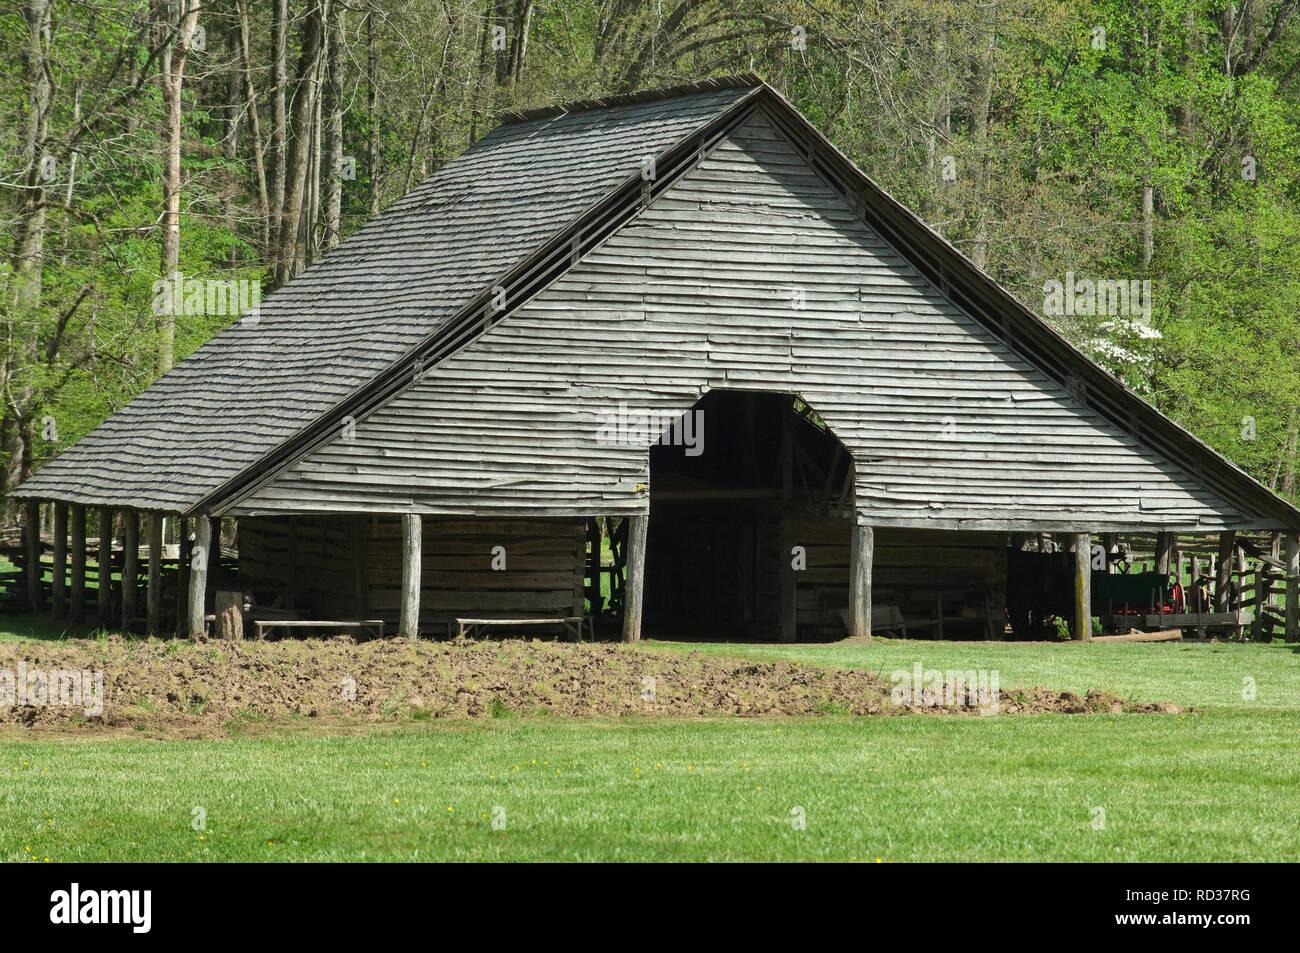 Livestock barn, Great Smoky Mountains National Park, border of NC and TN. Digital photograph - Stock Image